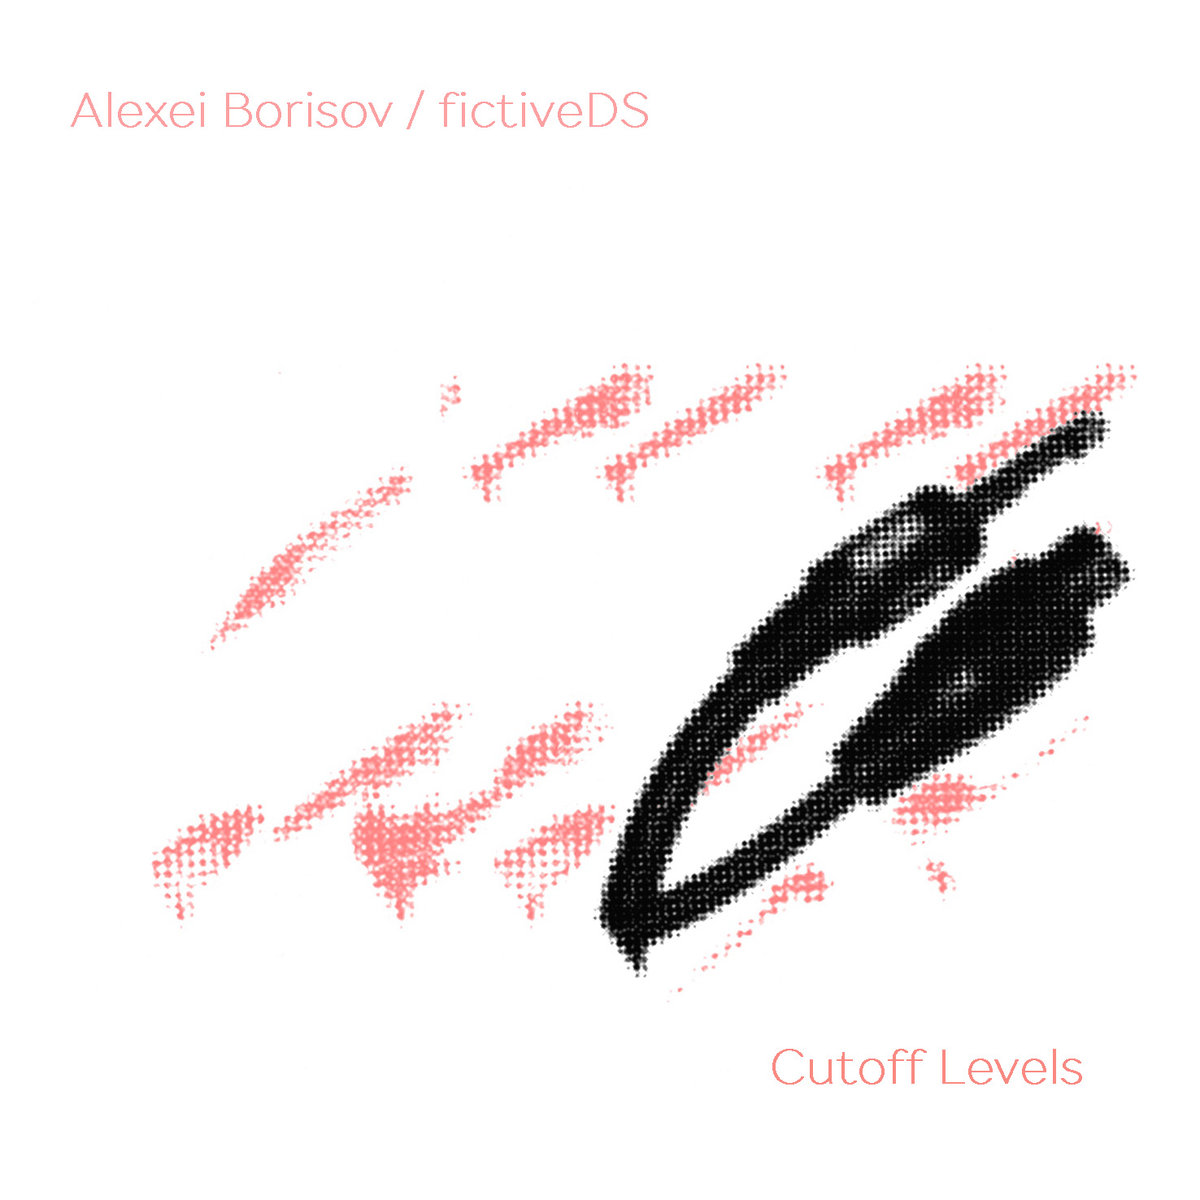 Alexei Borisov / fictiveDS - Cutoff Levels